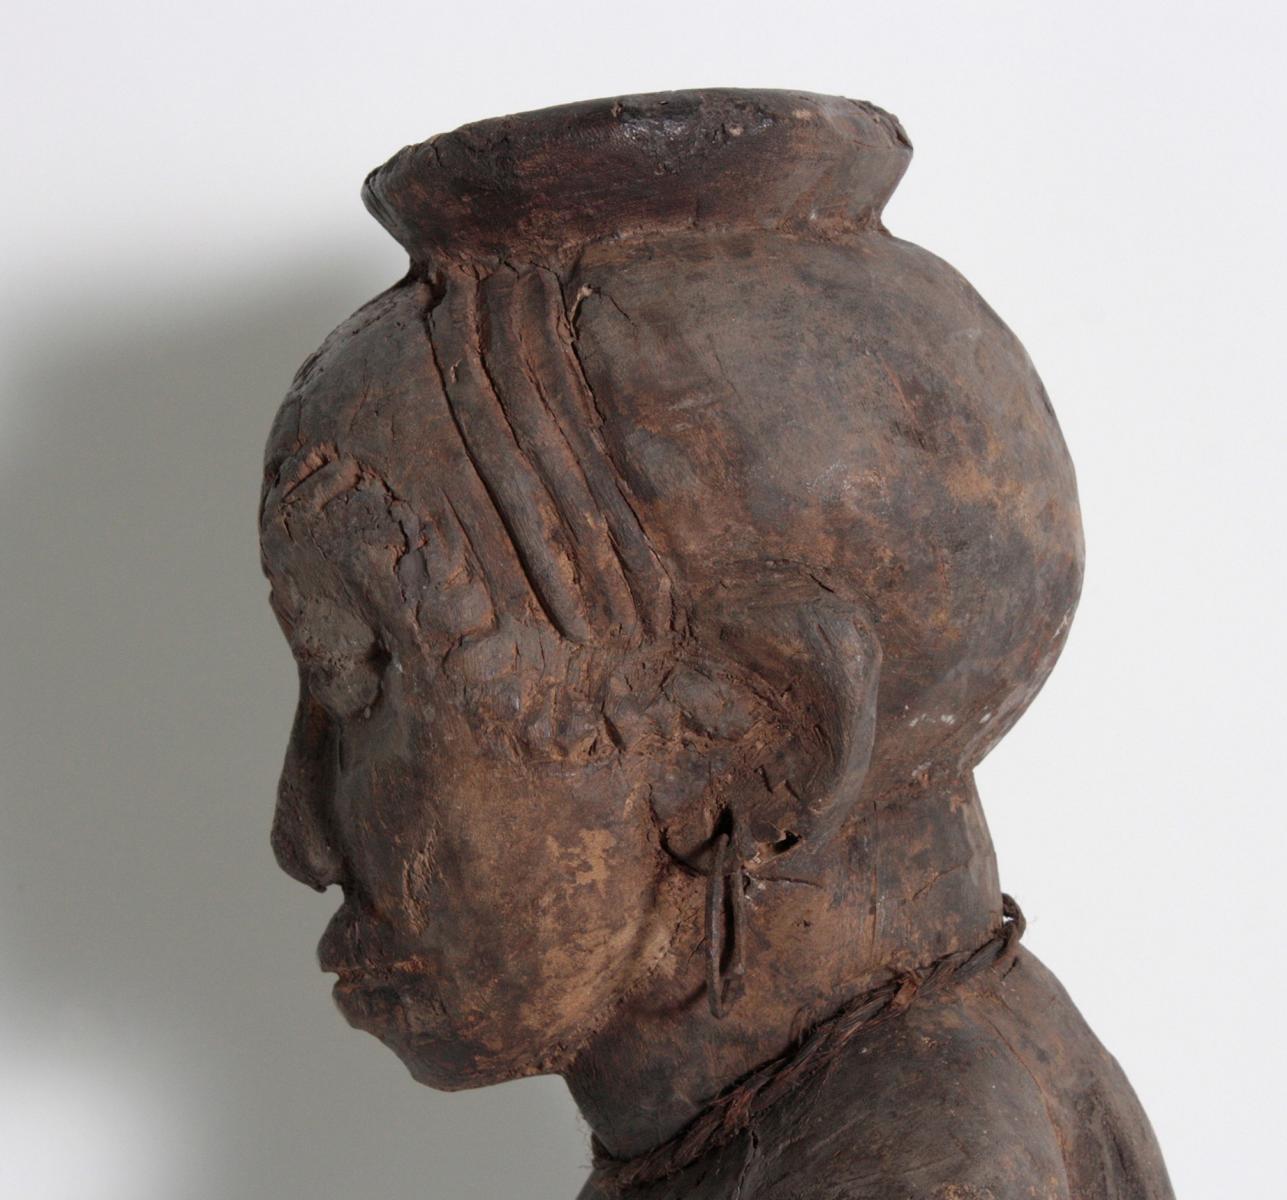 Ältere Ahnen-Figur, Tabwa, D. R. Kongo-6